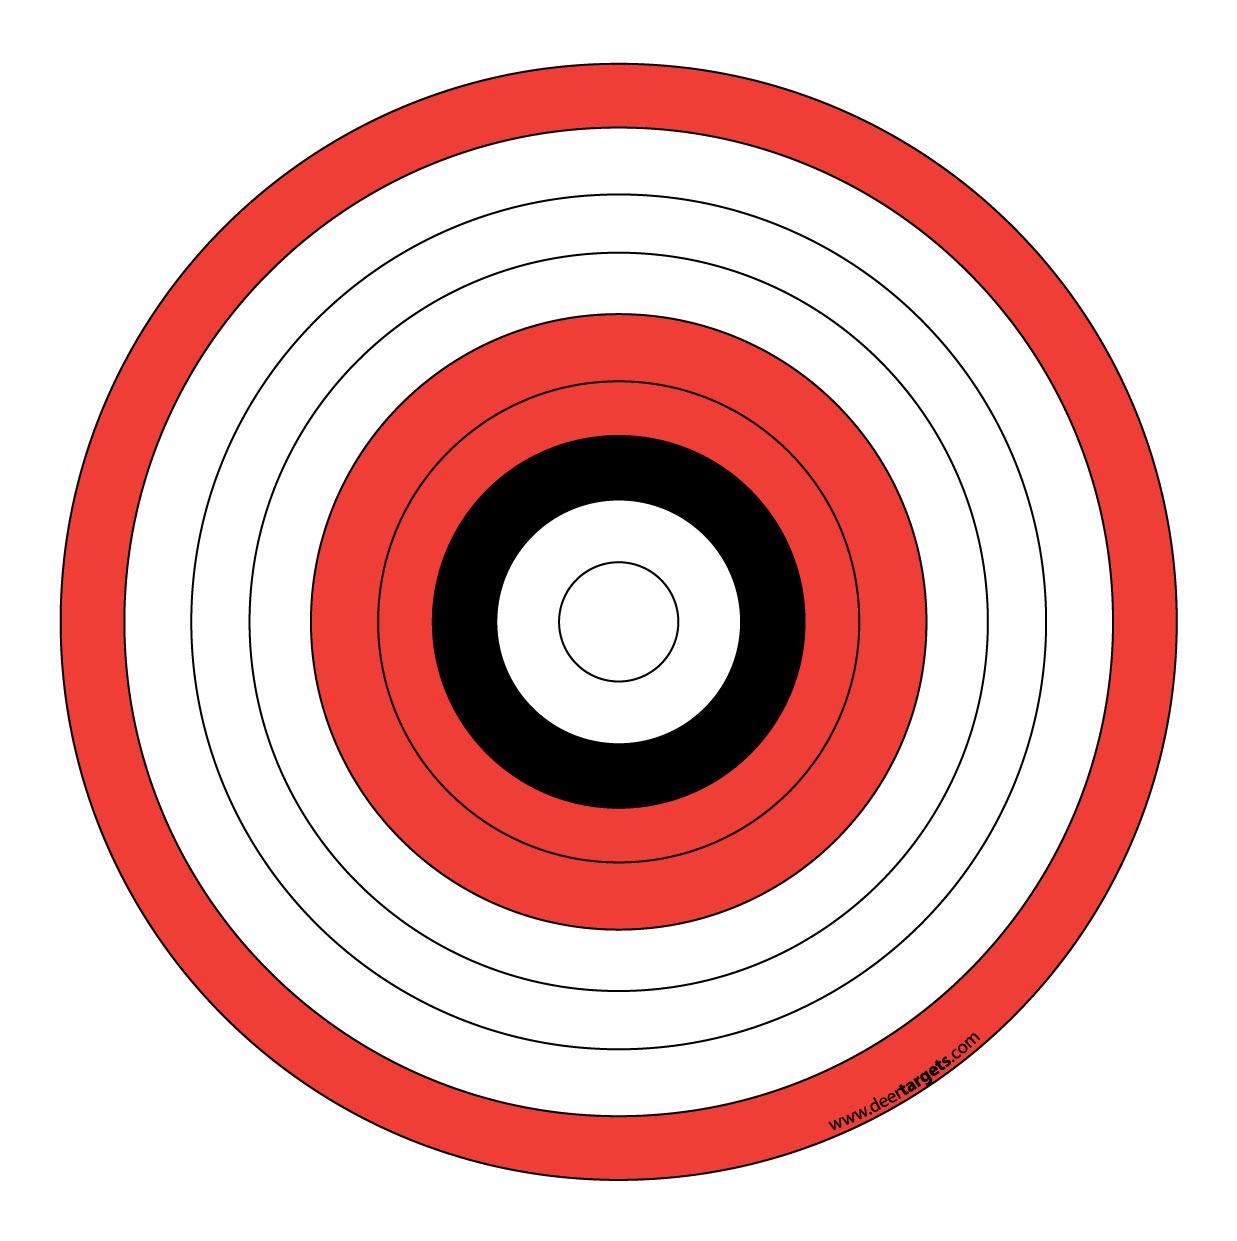 clip art target bullseye - photo #47